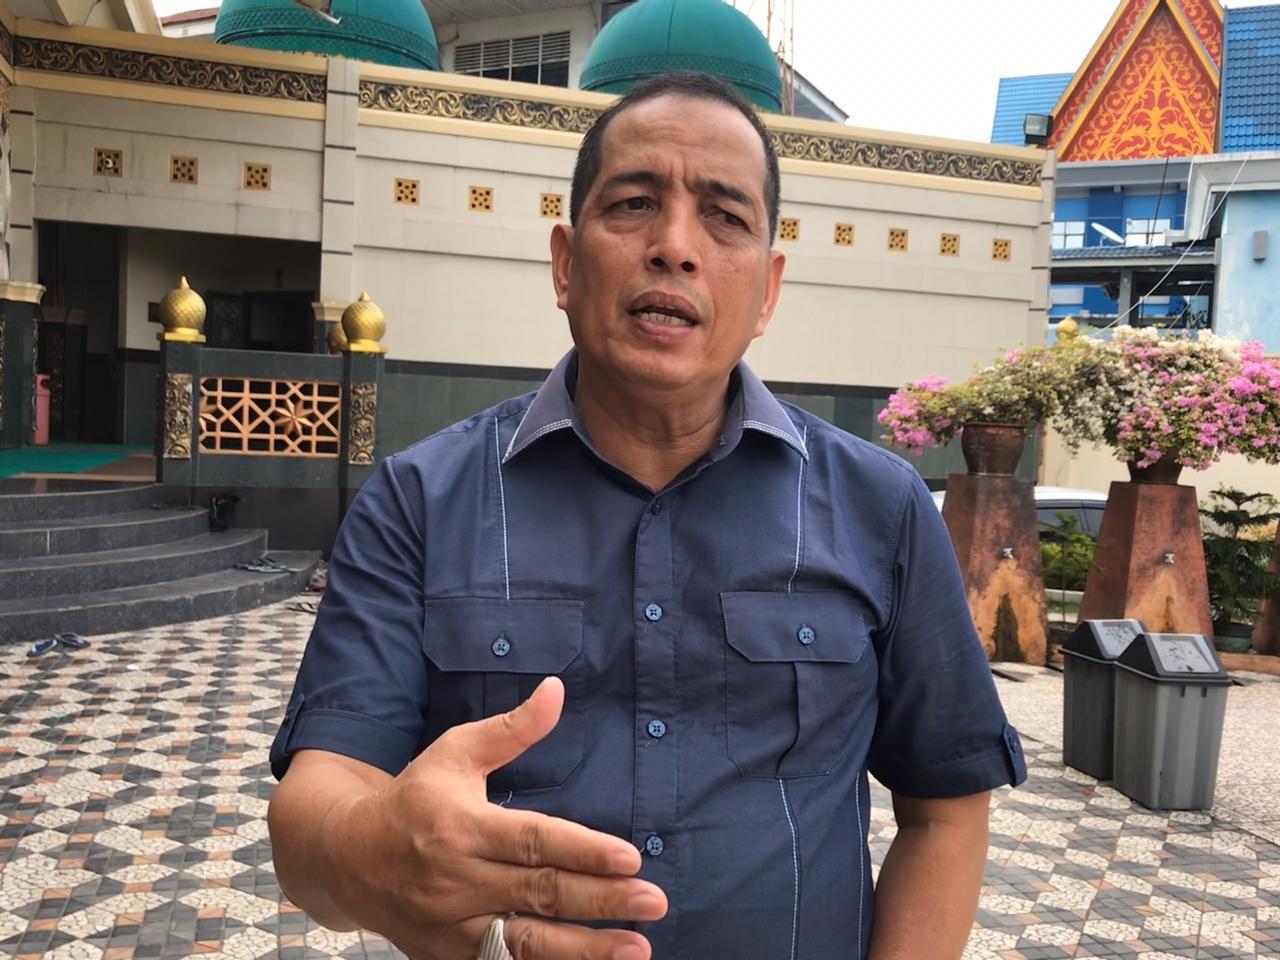 AHY Beri Pengaruh Besar Kemenangan Demokrat di Pilkada Riau